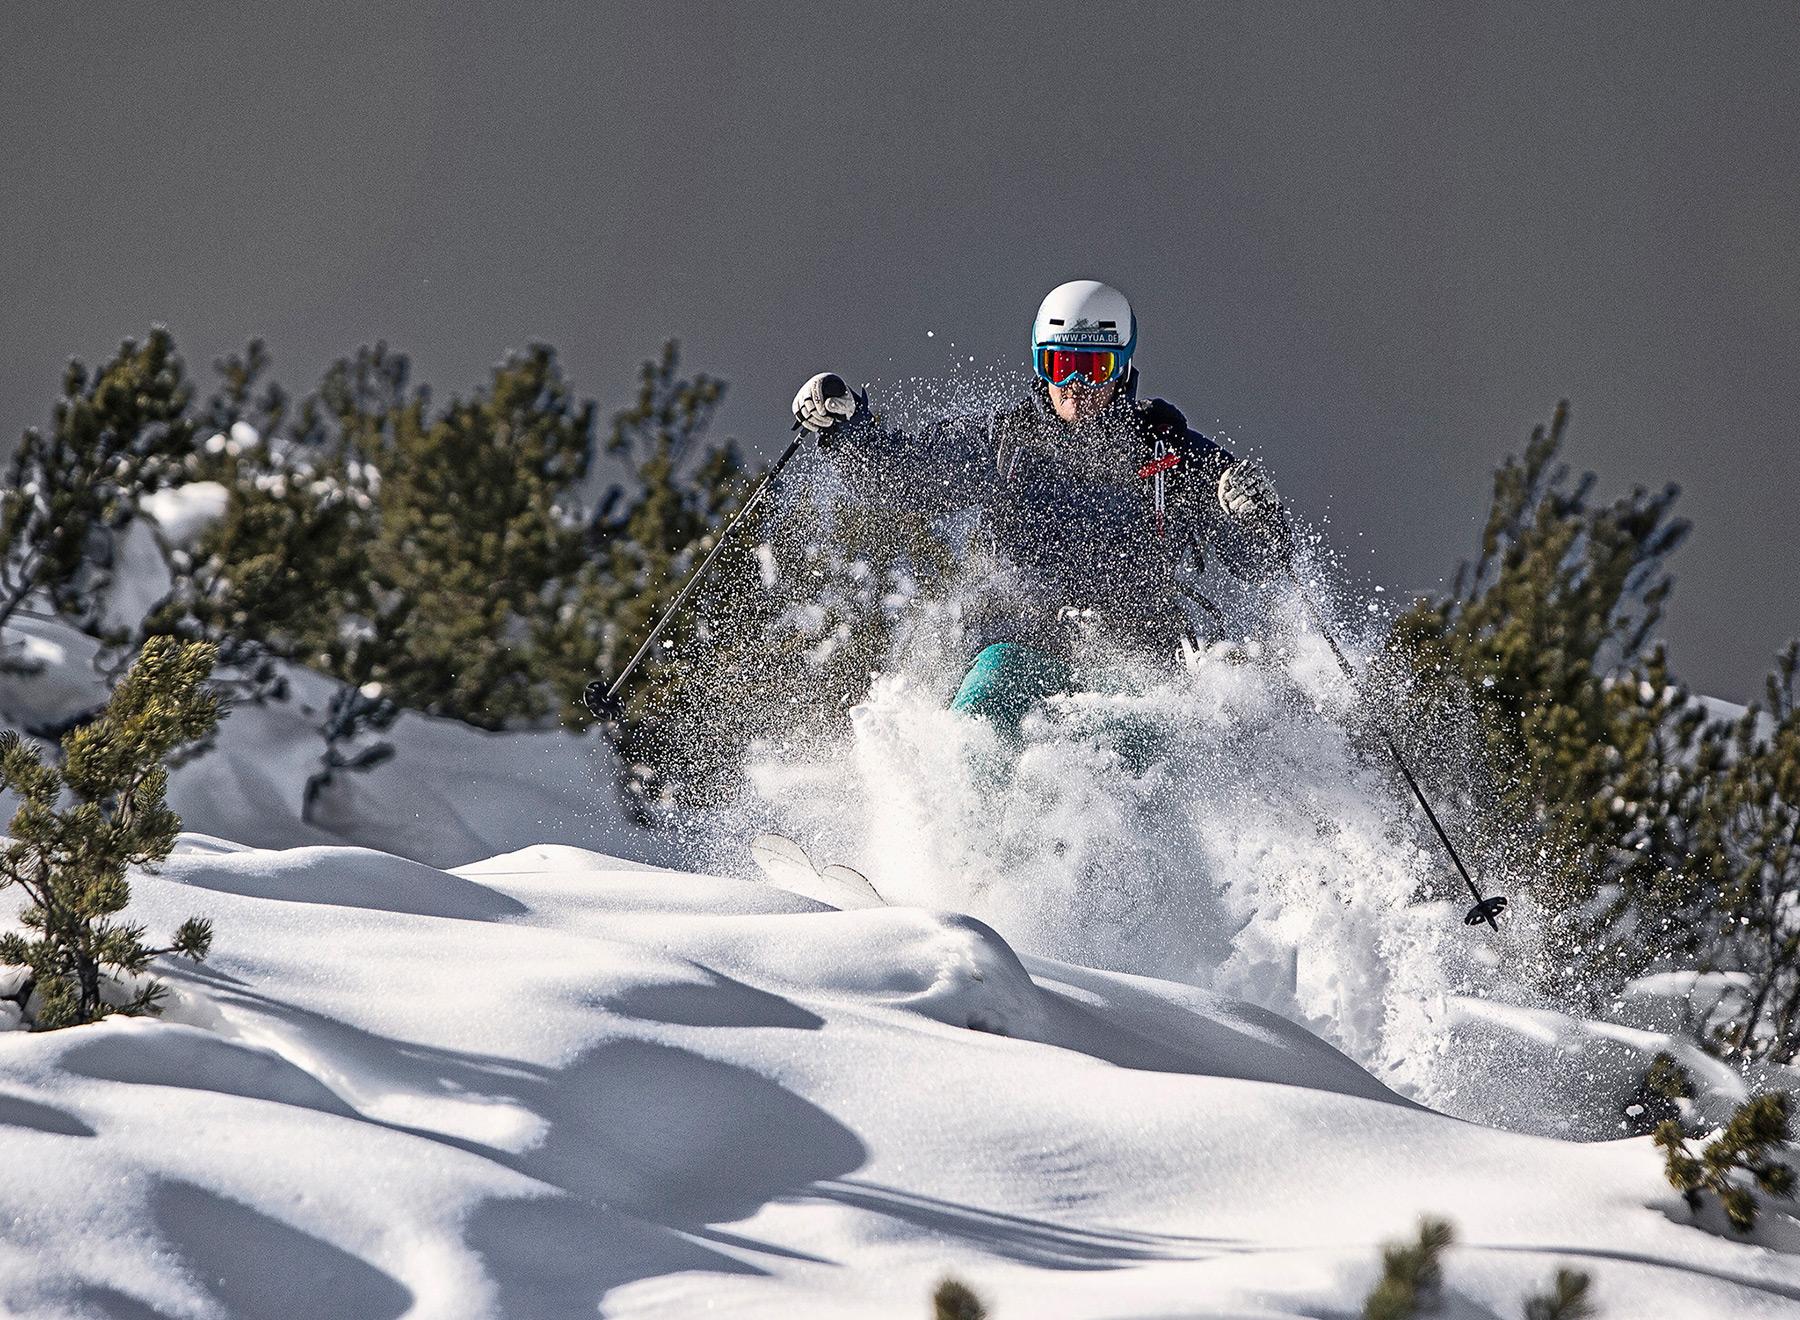 17-Pyua-Dachstein-Ski-Action-Christoph-Gramann